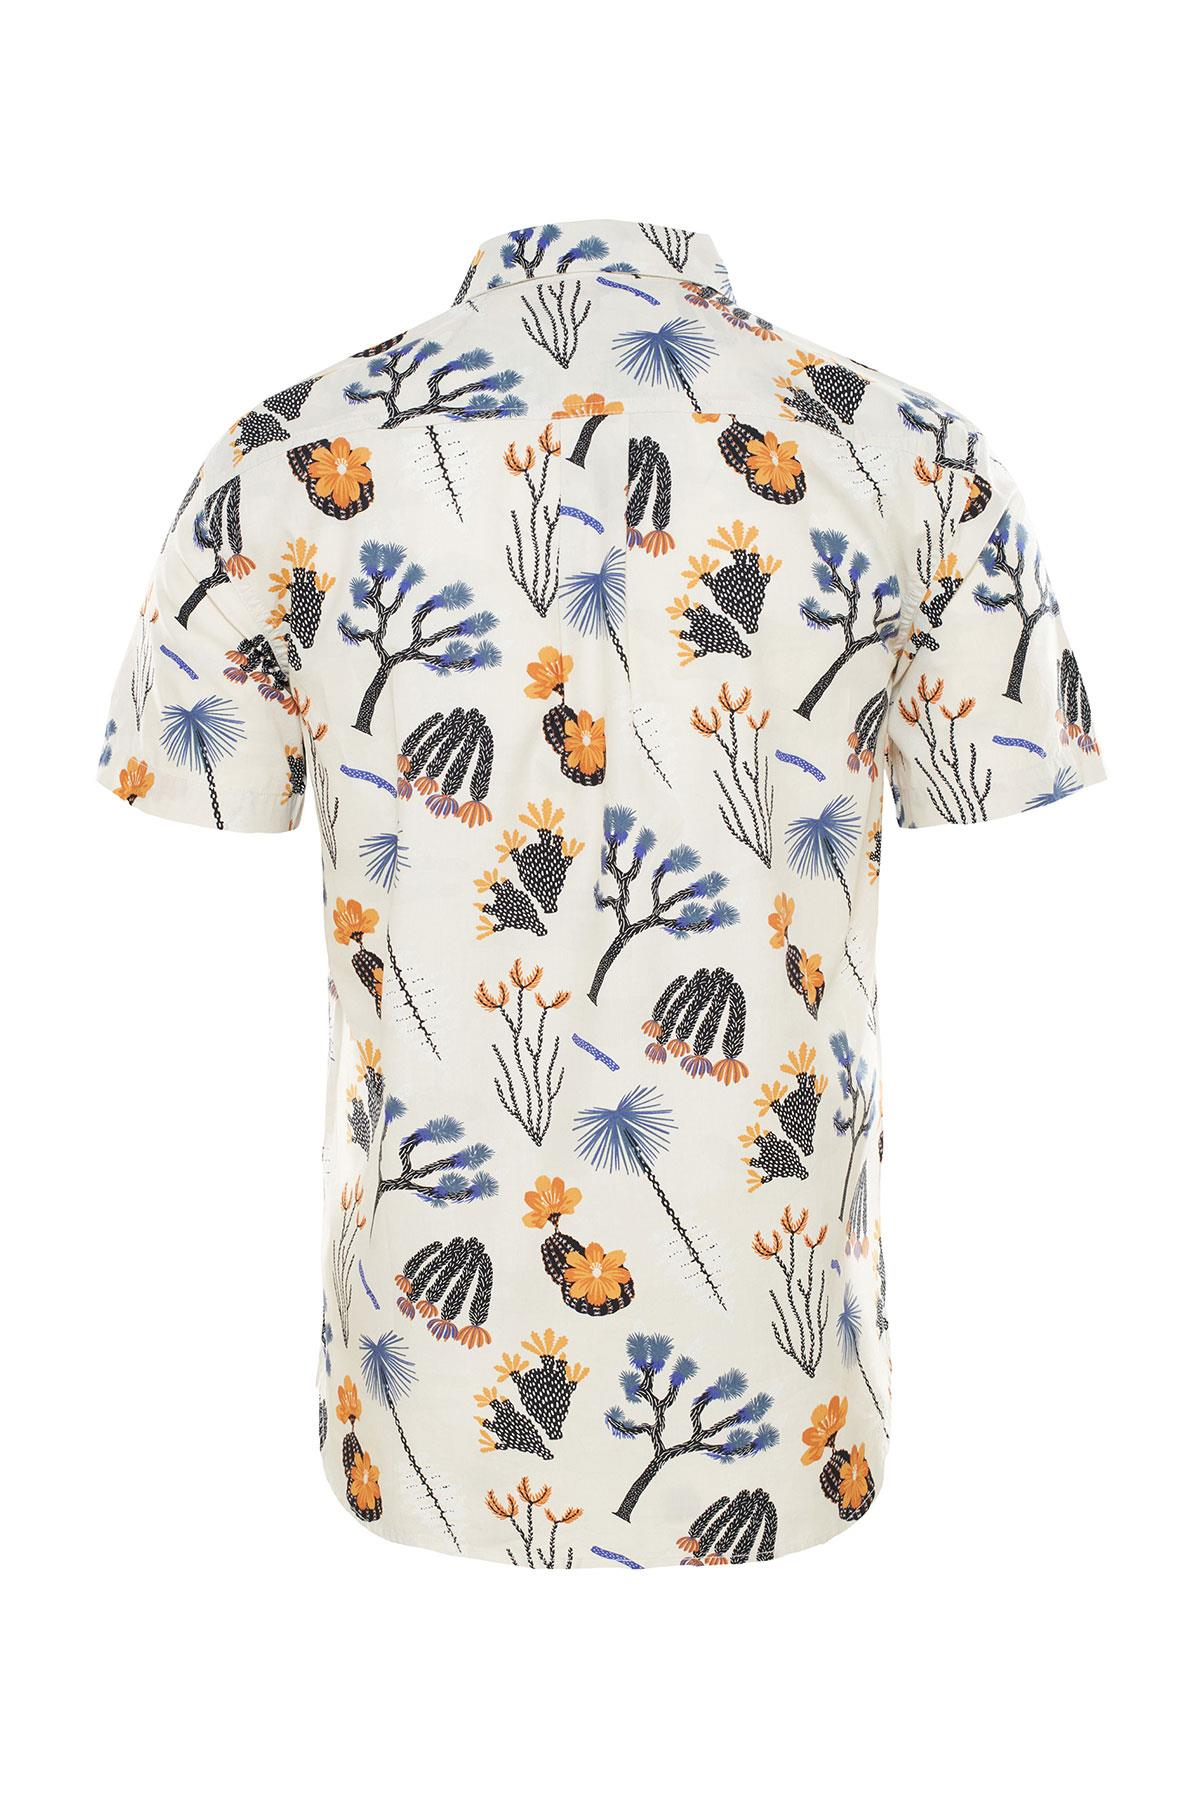 The Northface Erkek S/S Baytrail Shirt T93T1F9Xe Gömlek